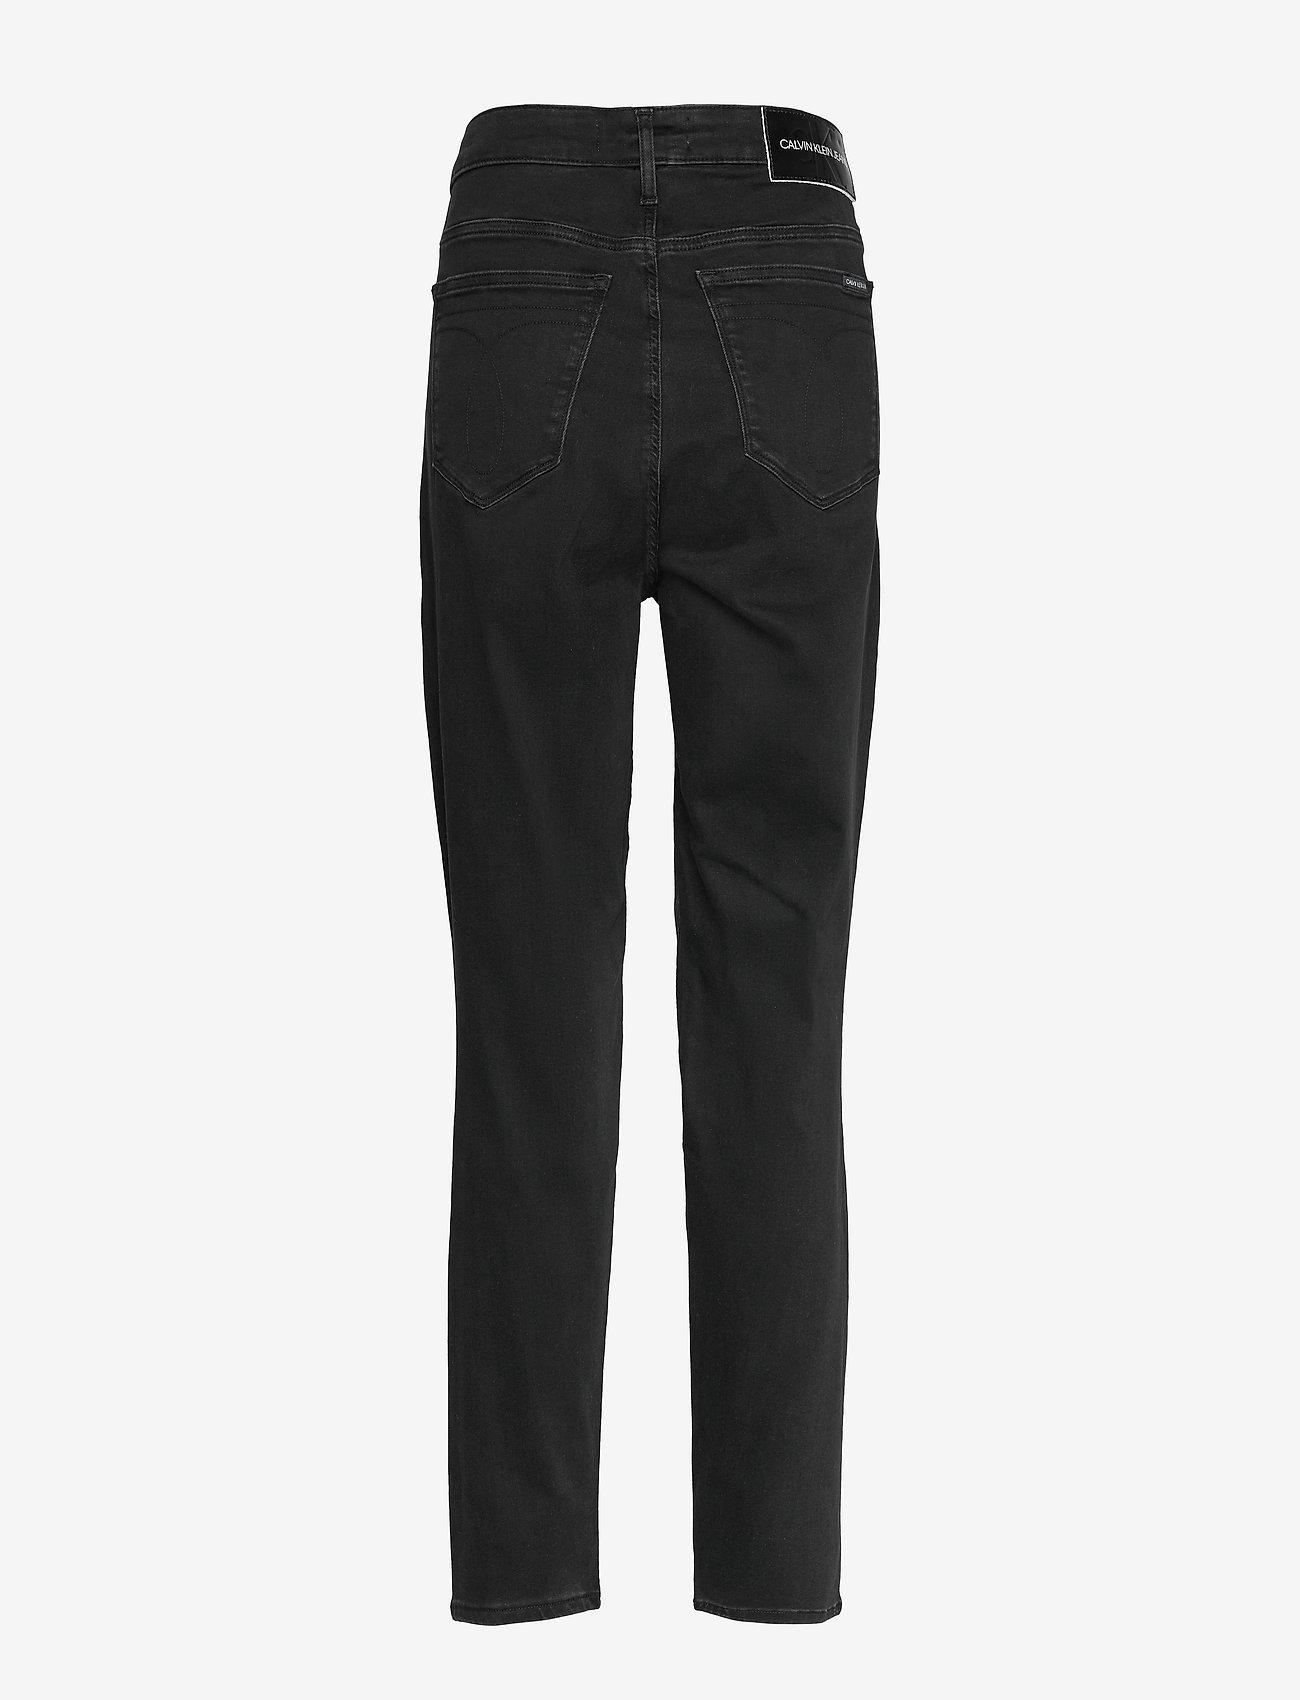 Plus High Rise Skinny (Ca121 Denim Black) - Calvin Klein Jeans vNEZyZ